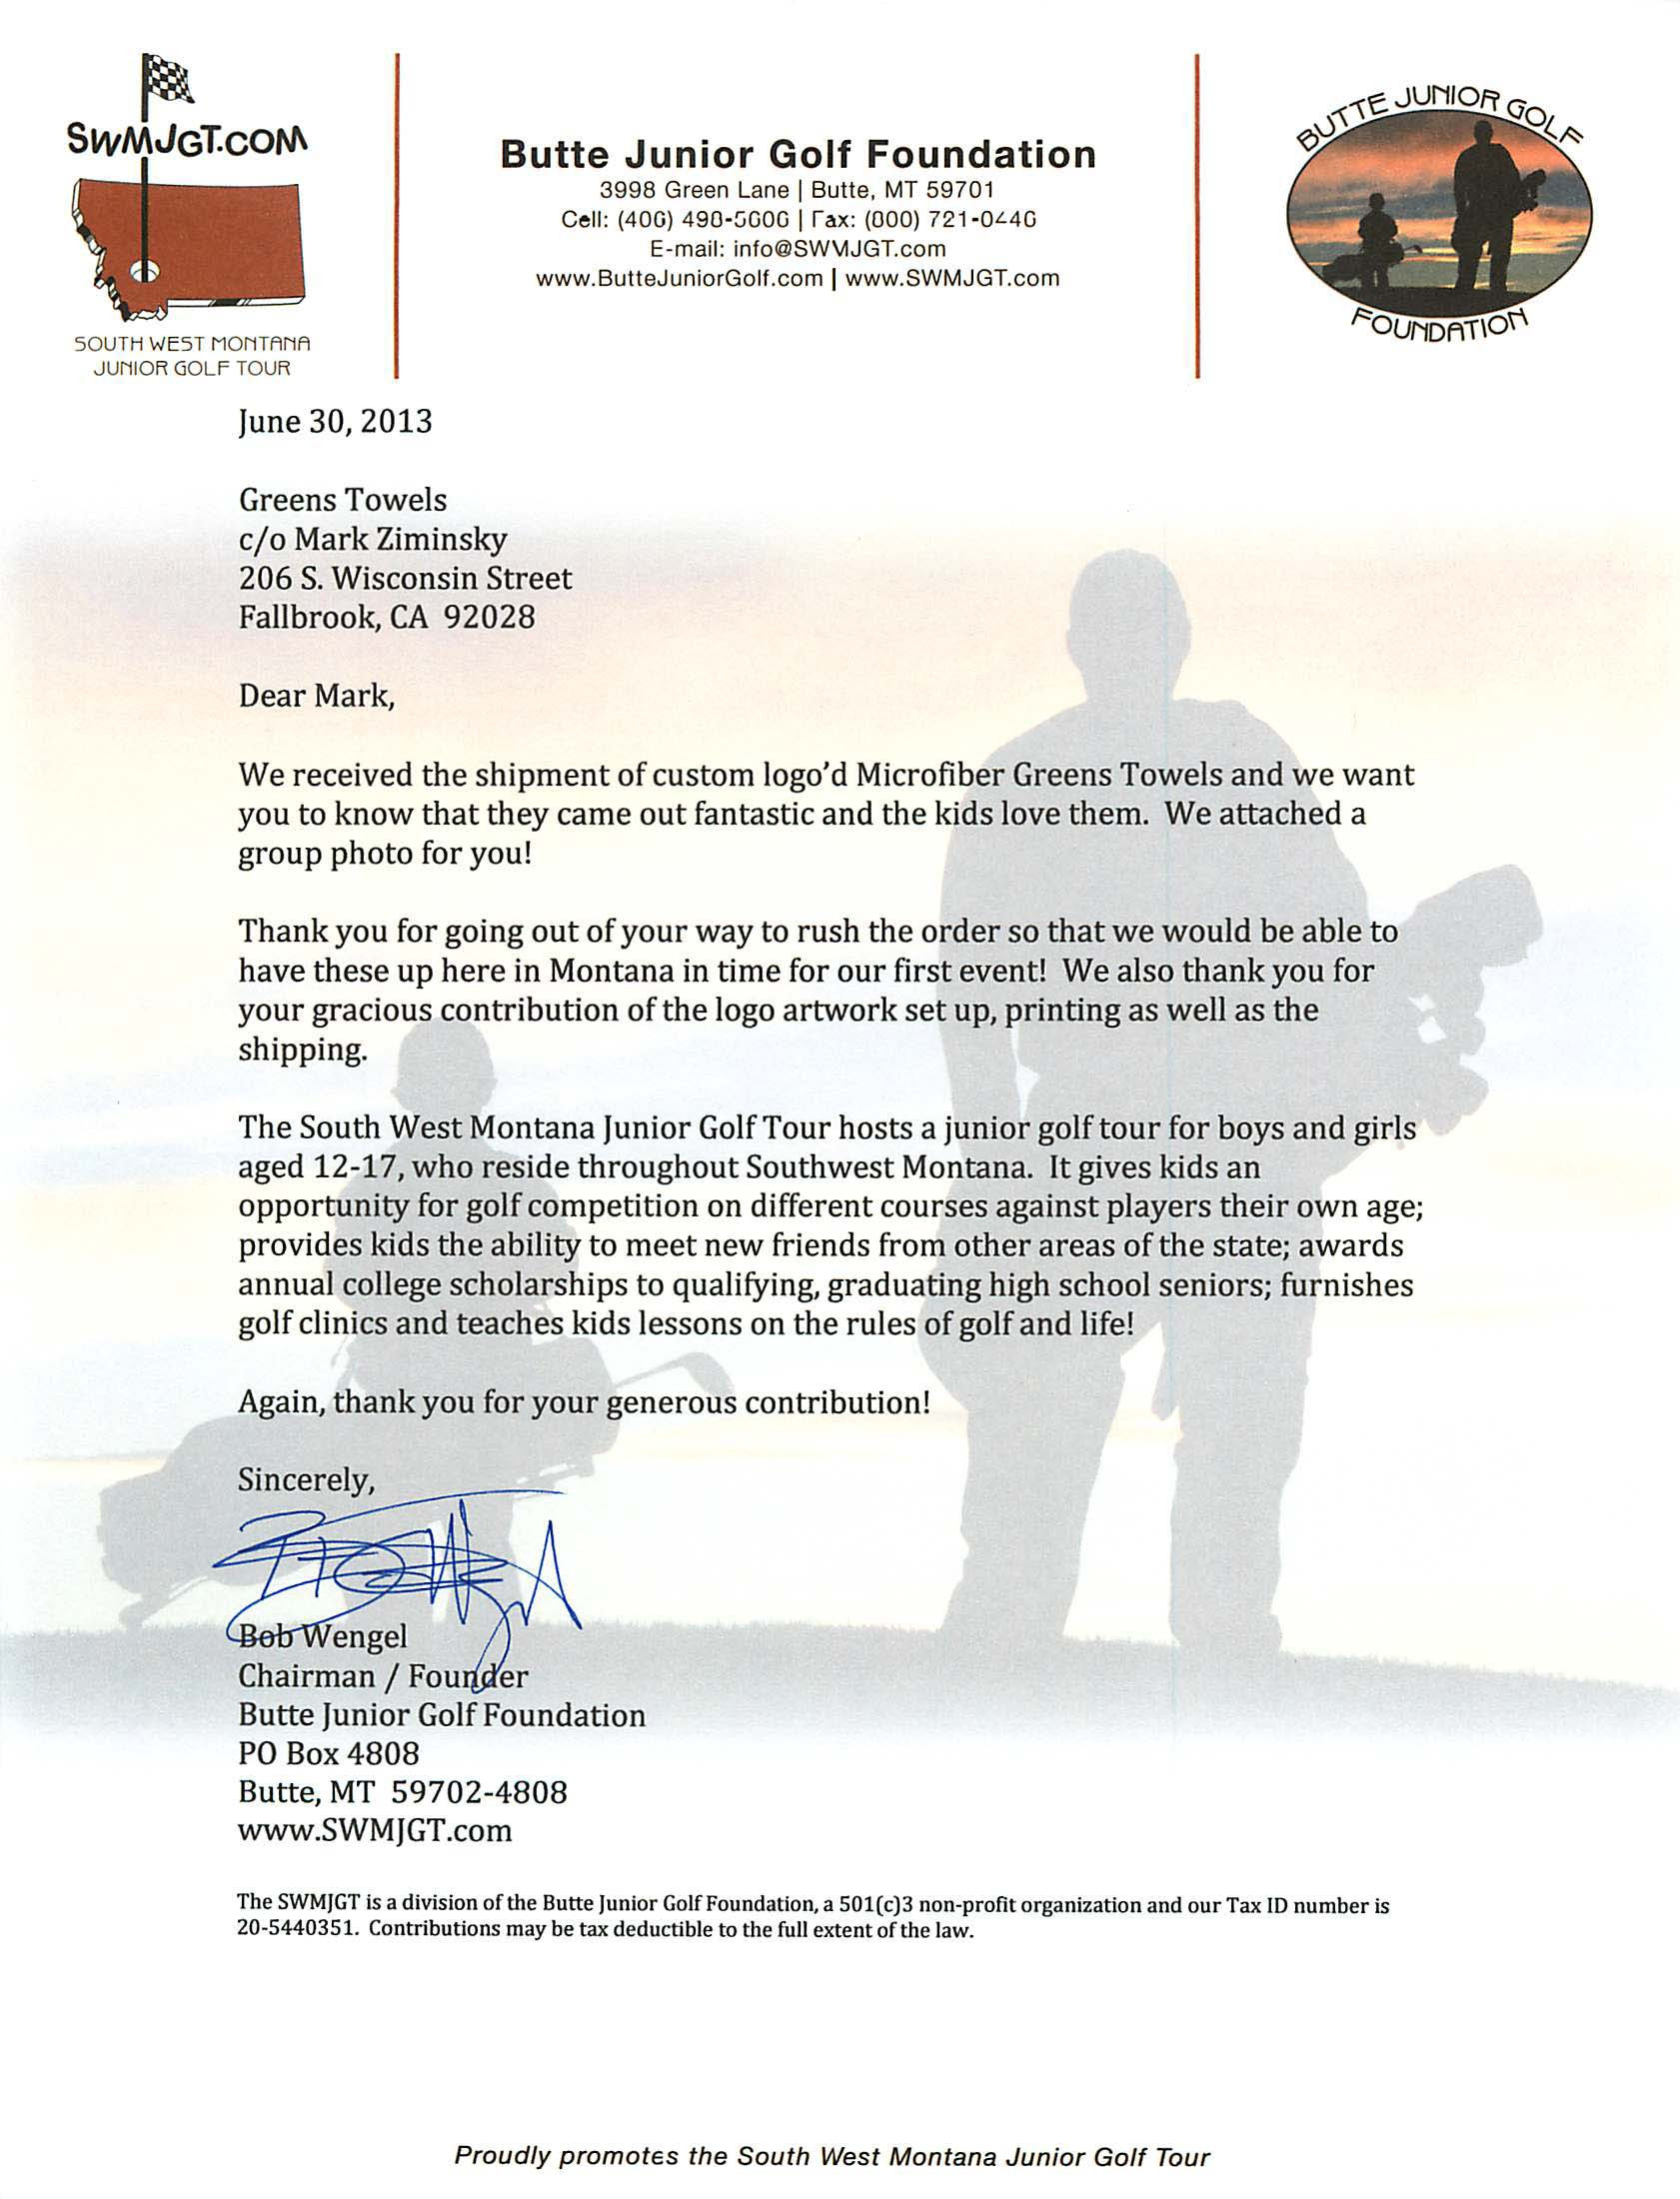 Golf tournament Donation Letter Template - 40 Fresh Sponsorship Request Letter for event